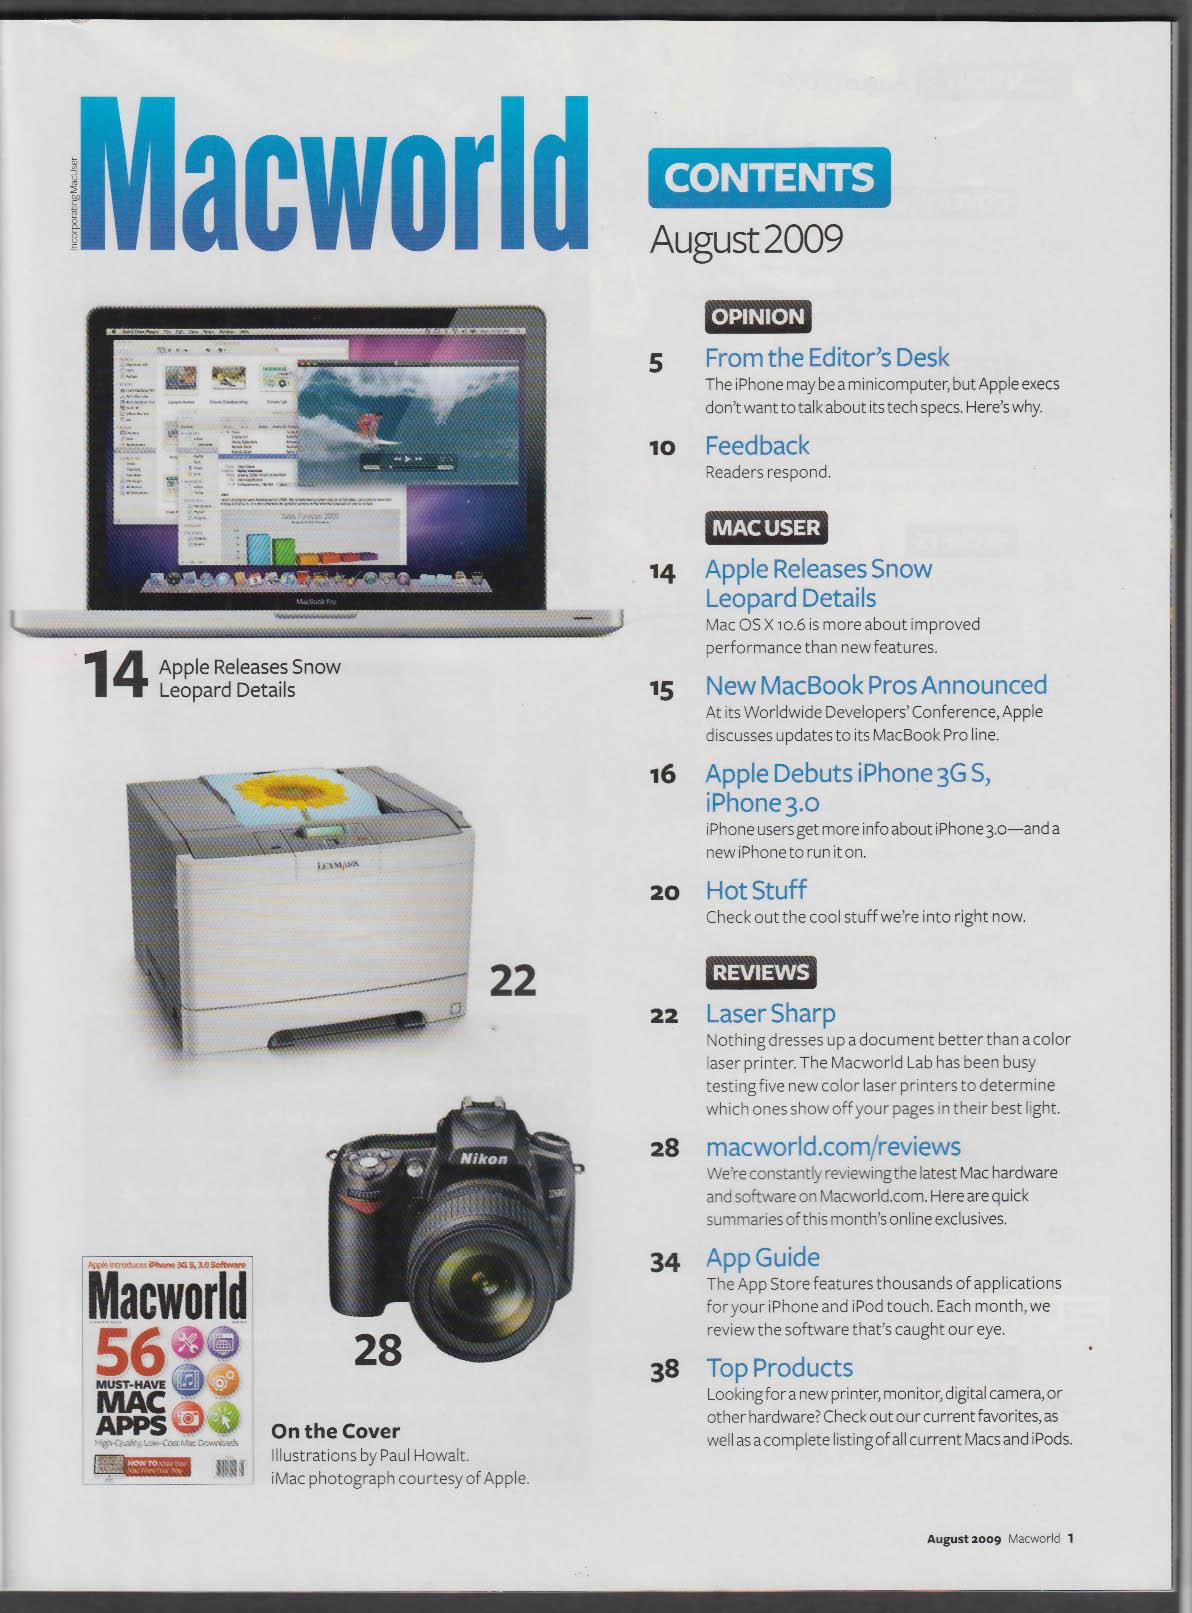 MACWORLD Apple iPhone 3G S MacBook Pro Mac ++ 8 2009